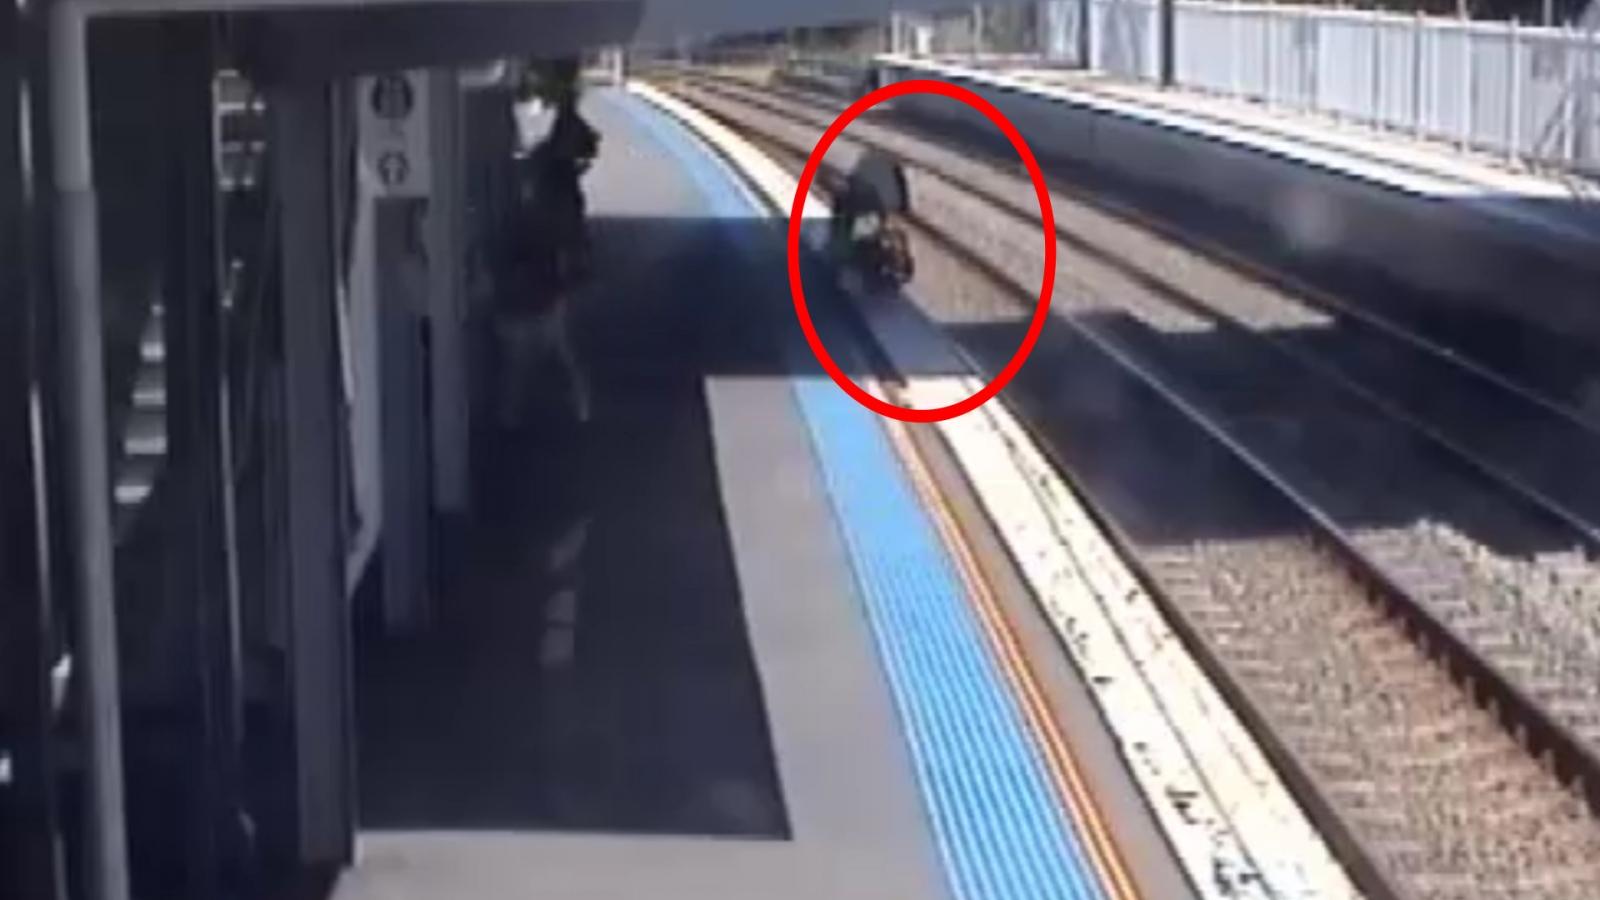 Mum Desperately Rescues Baby as Pram Rolls on to Train Tracks